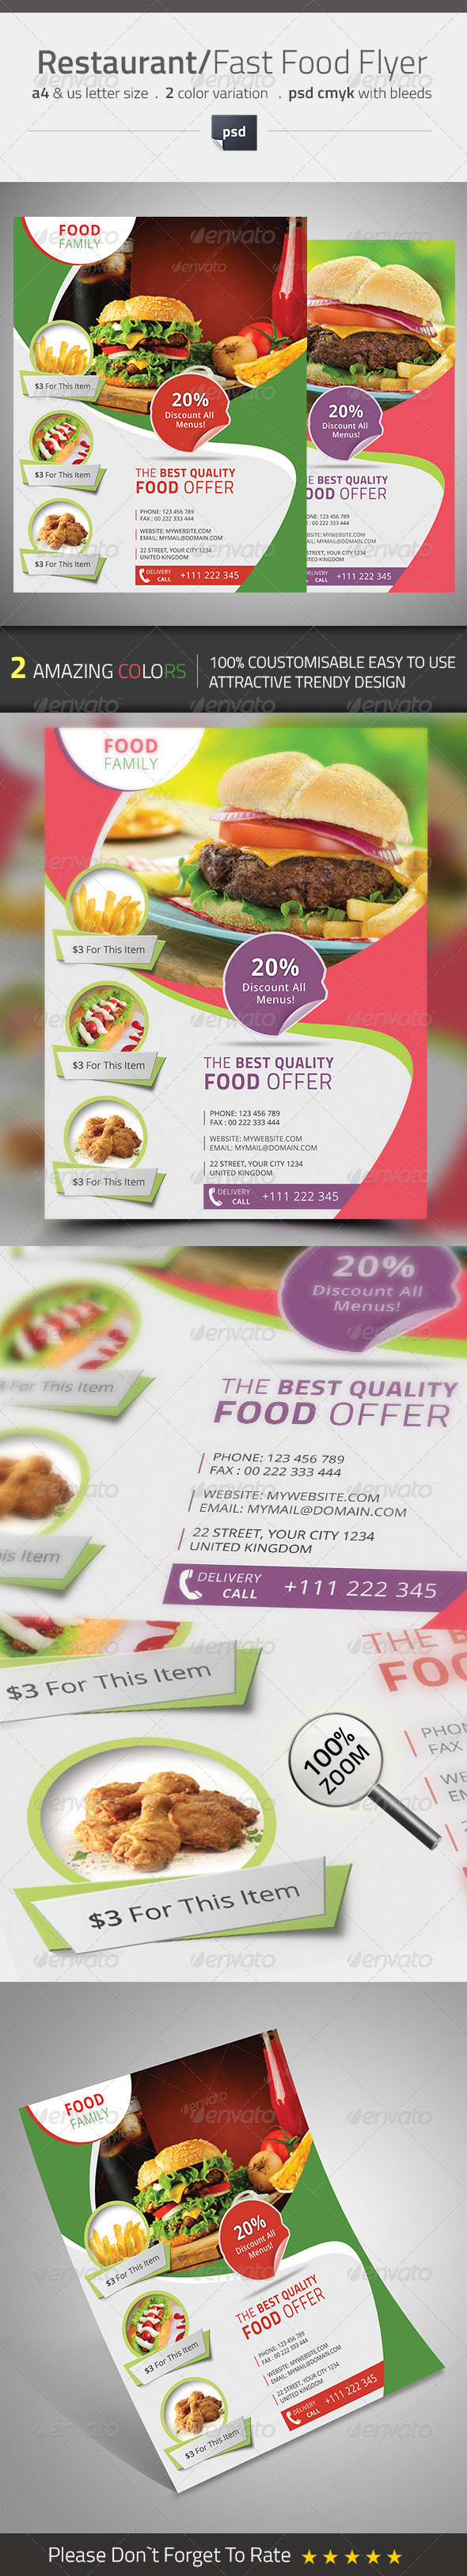 GraphicRiver Restaurant Fast Food Flyer 8550625